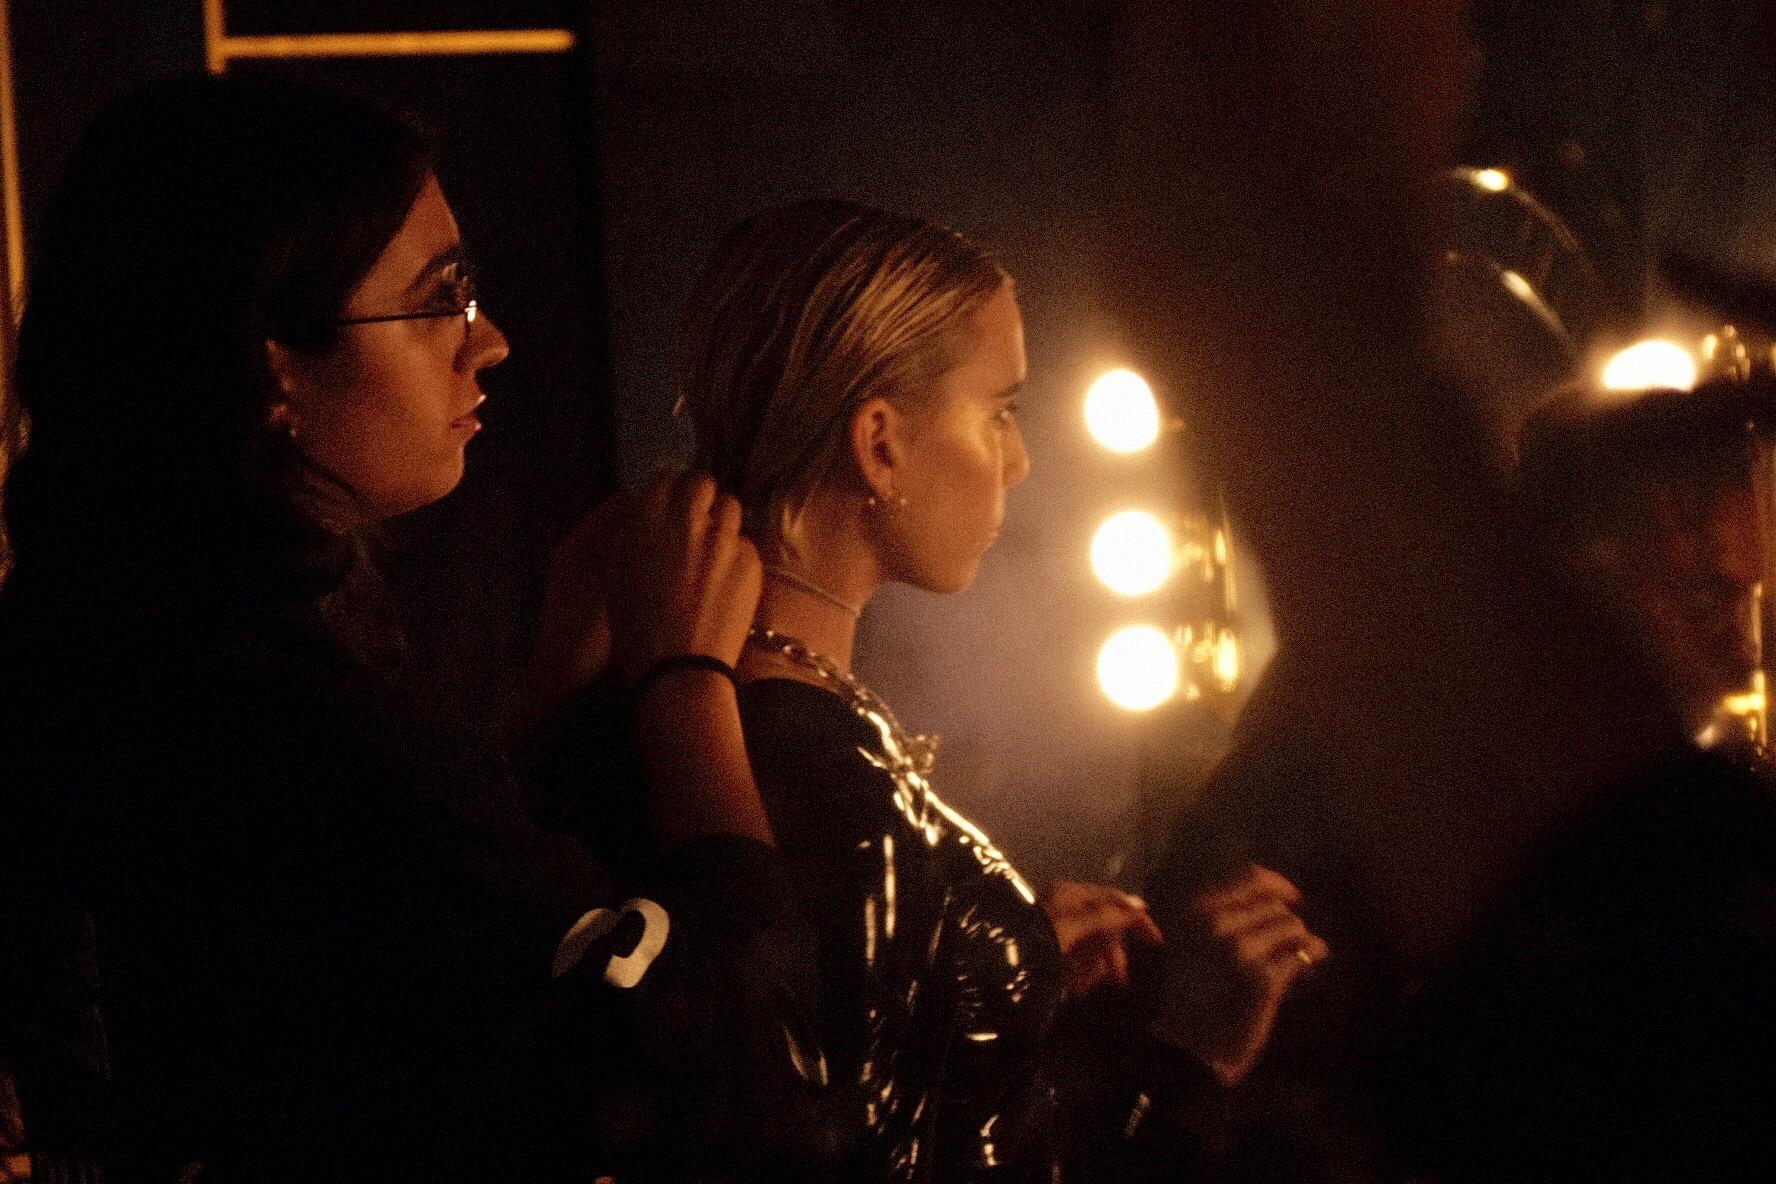 Backstage with Lykke Li. Photo by Charlotte Dawes.